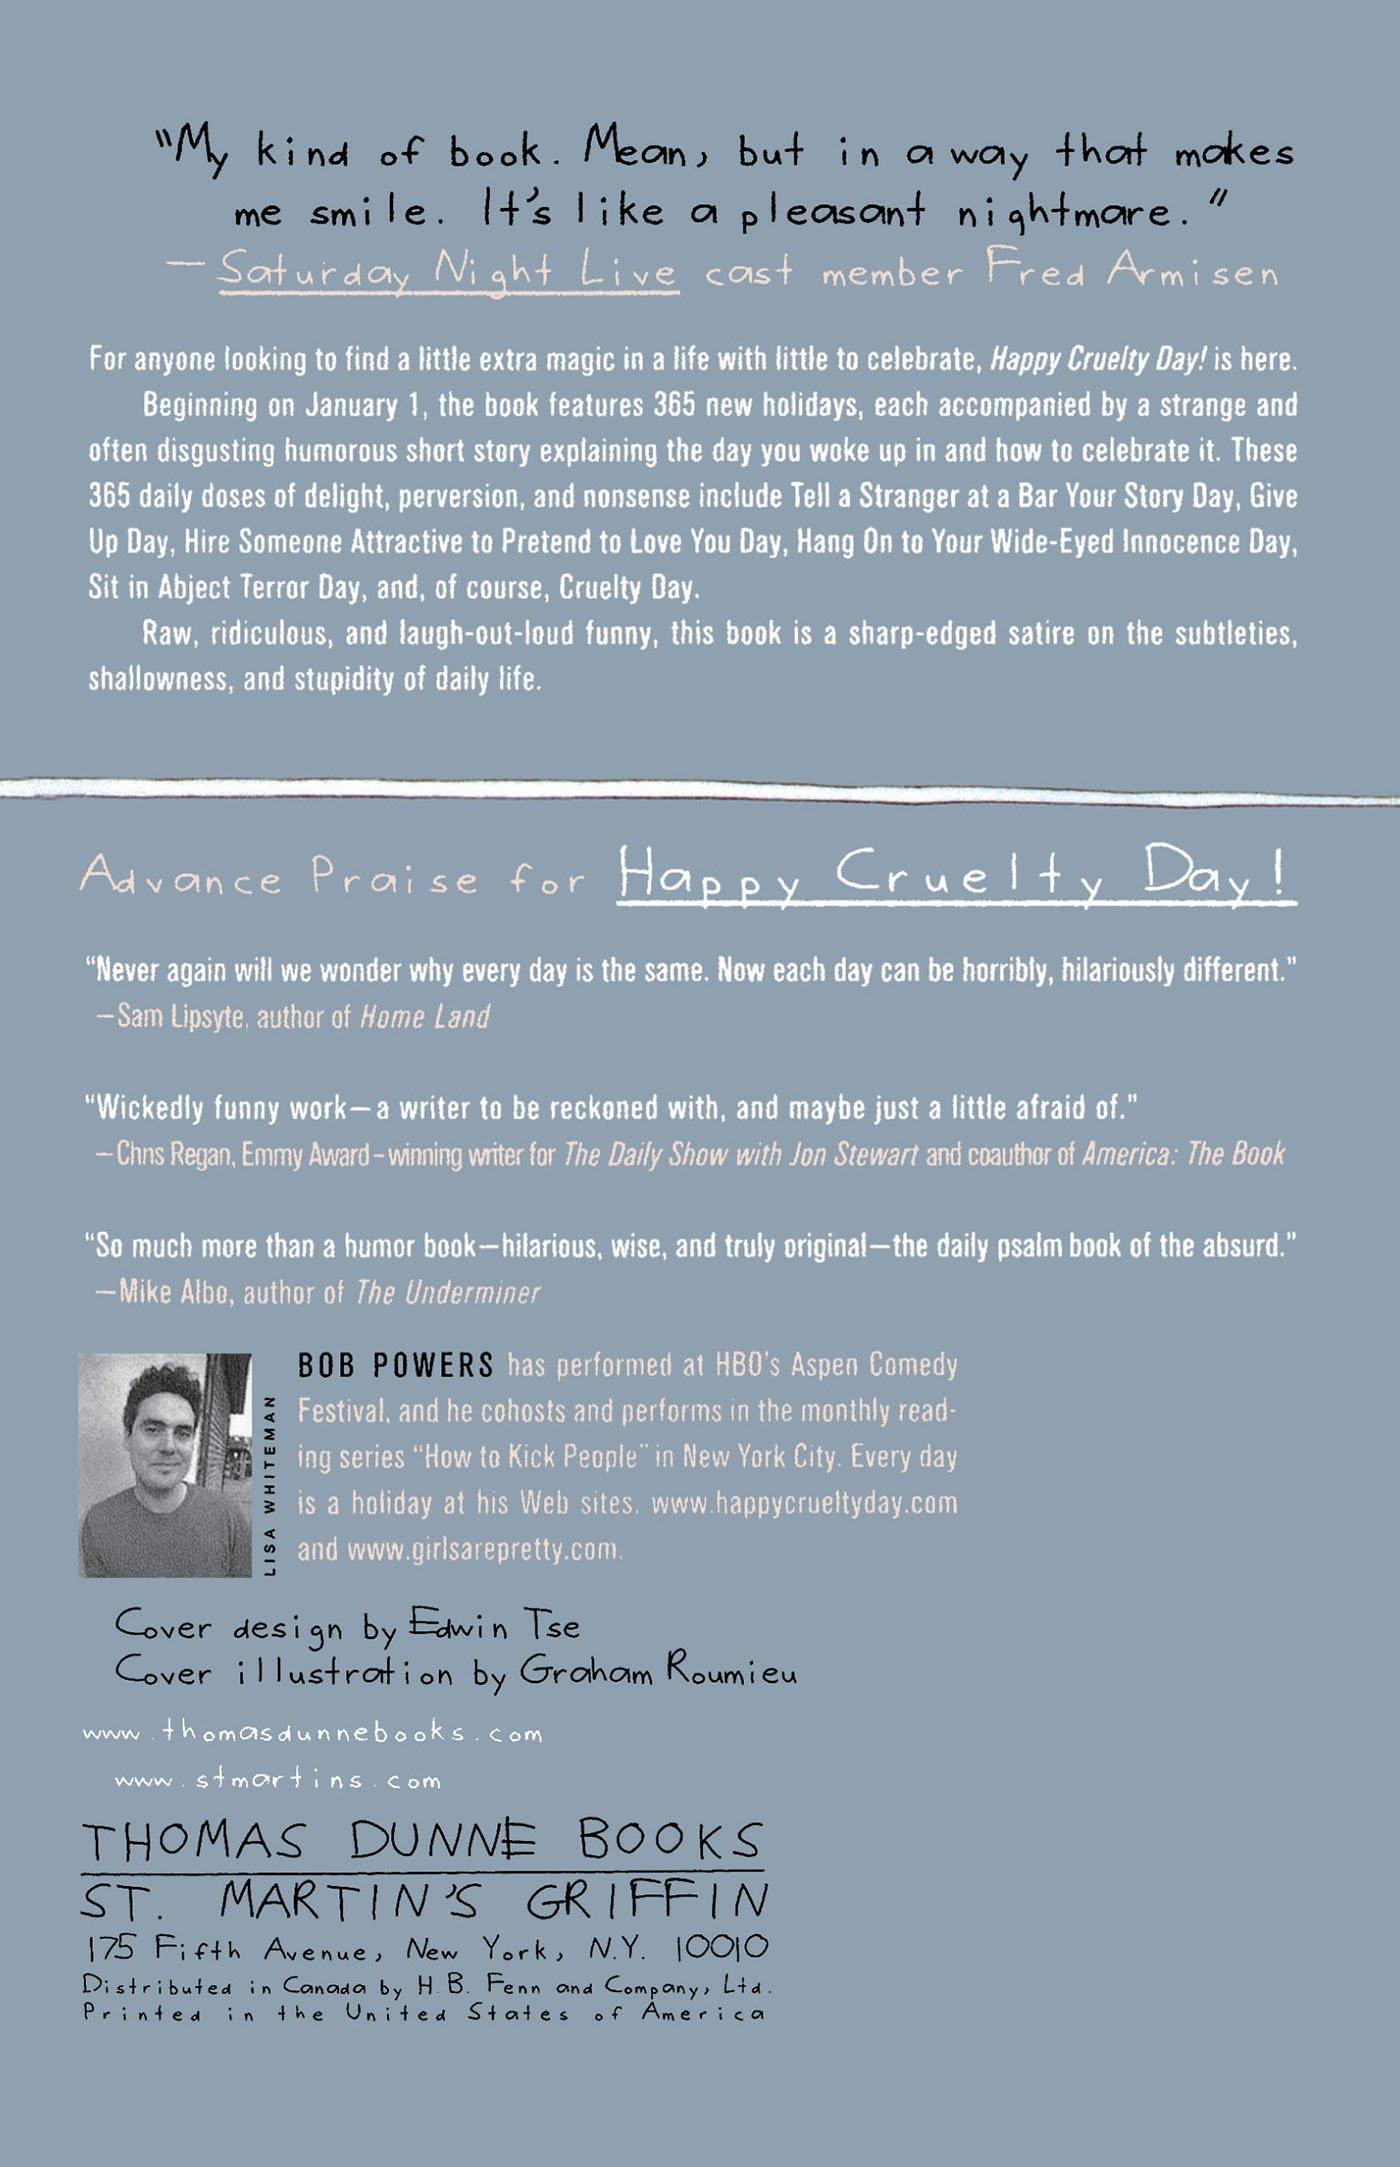 Happy Cruelty Day!: Daily Celebrations Of Quiet Desperation: Bob Powers:  9780312359522: Amazon: Books